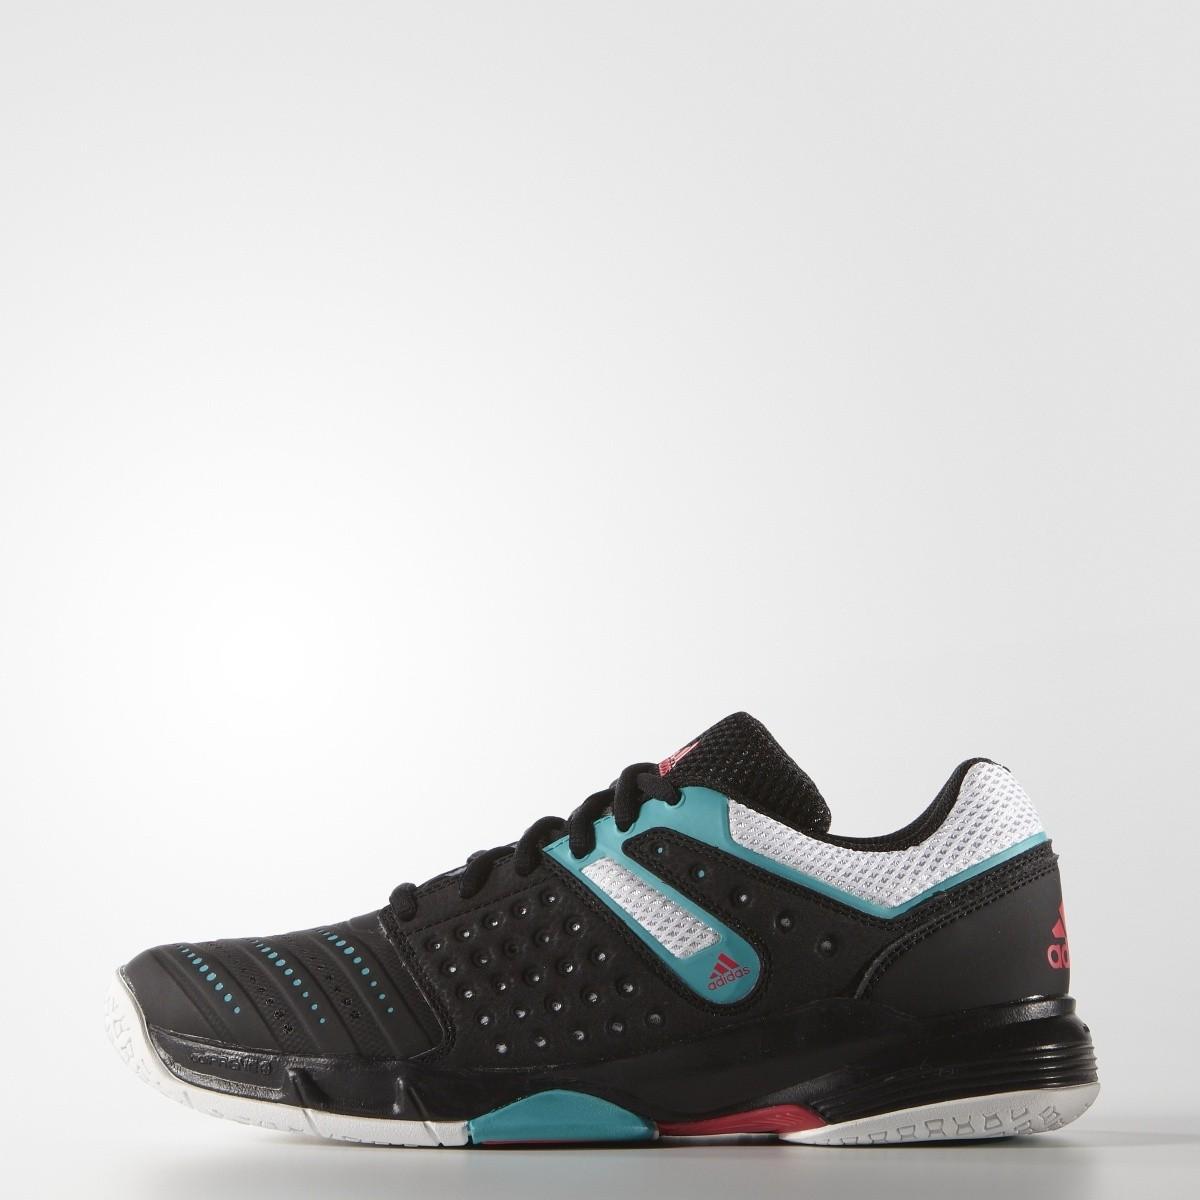 22c3824a779 Dámská sálová obuv adidas court stabil 12 W